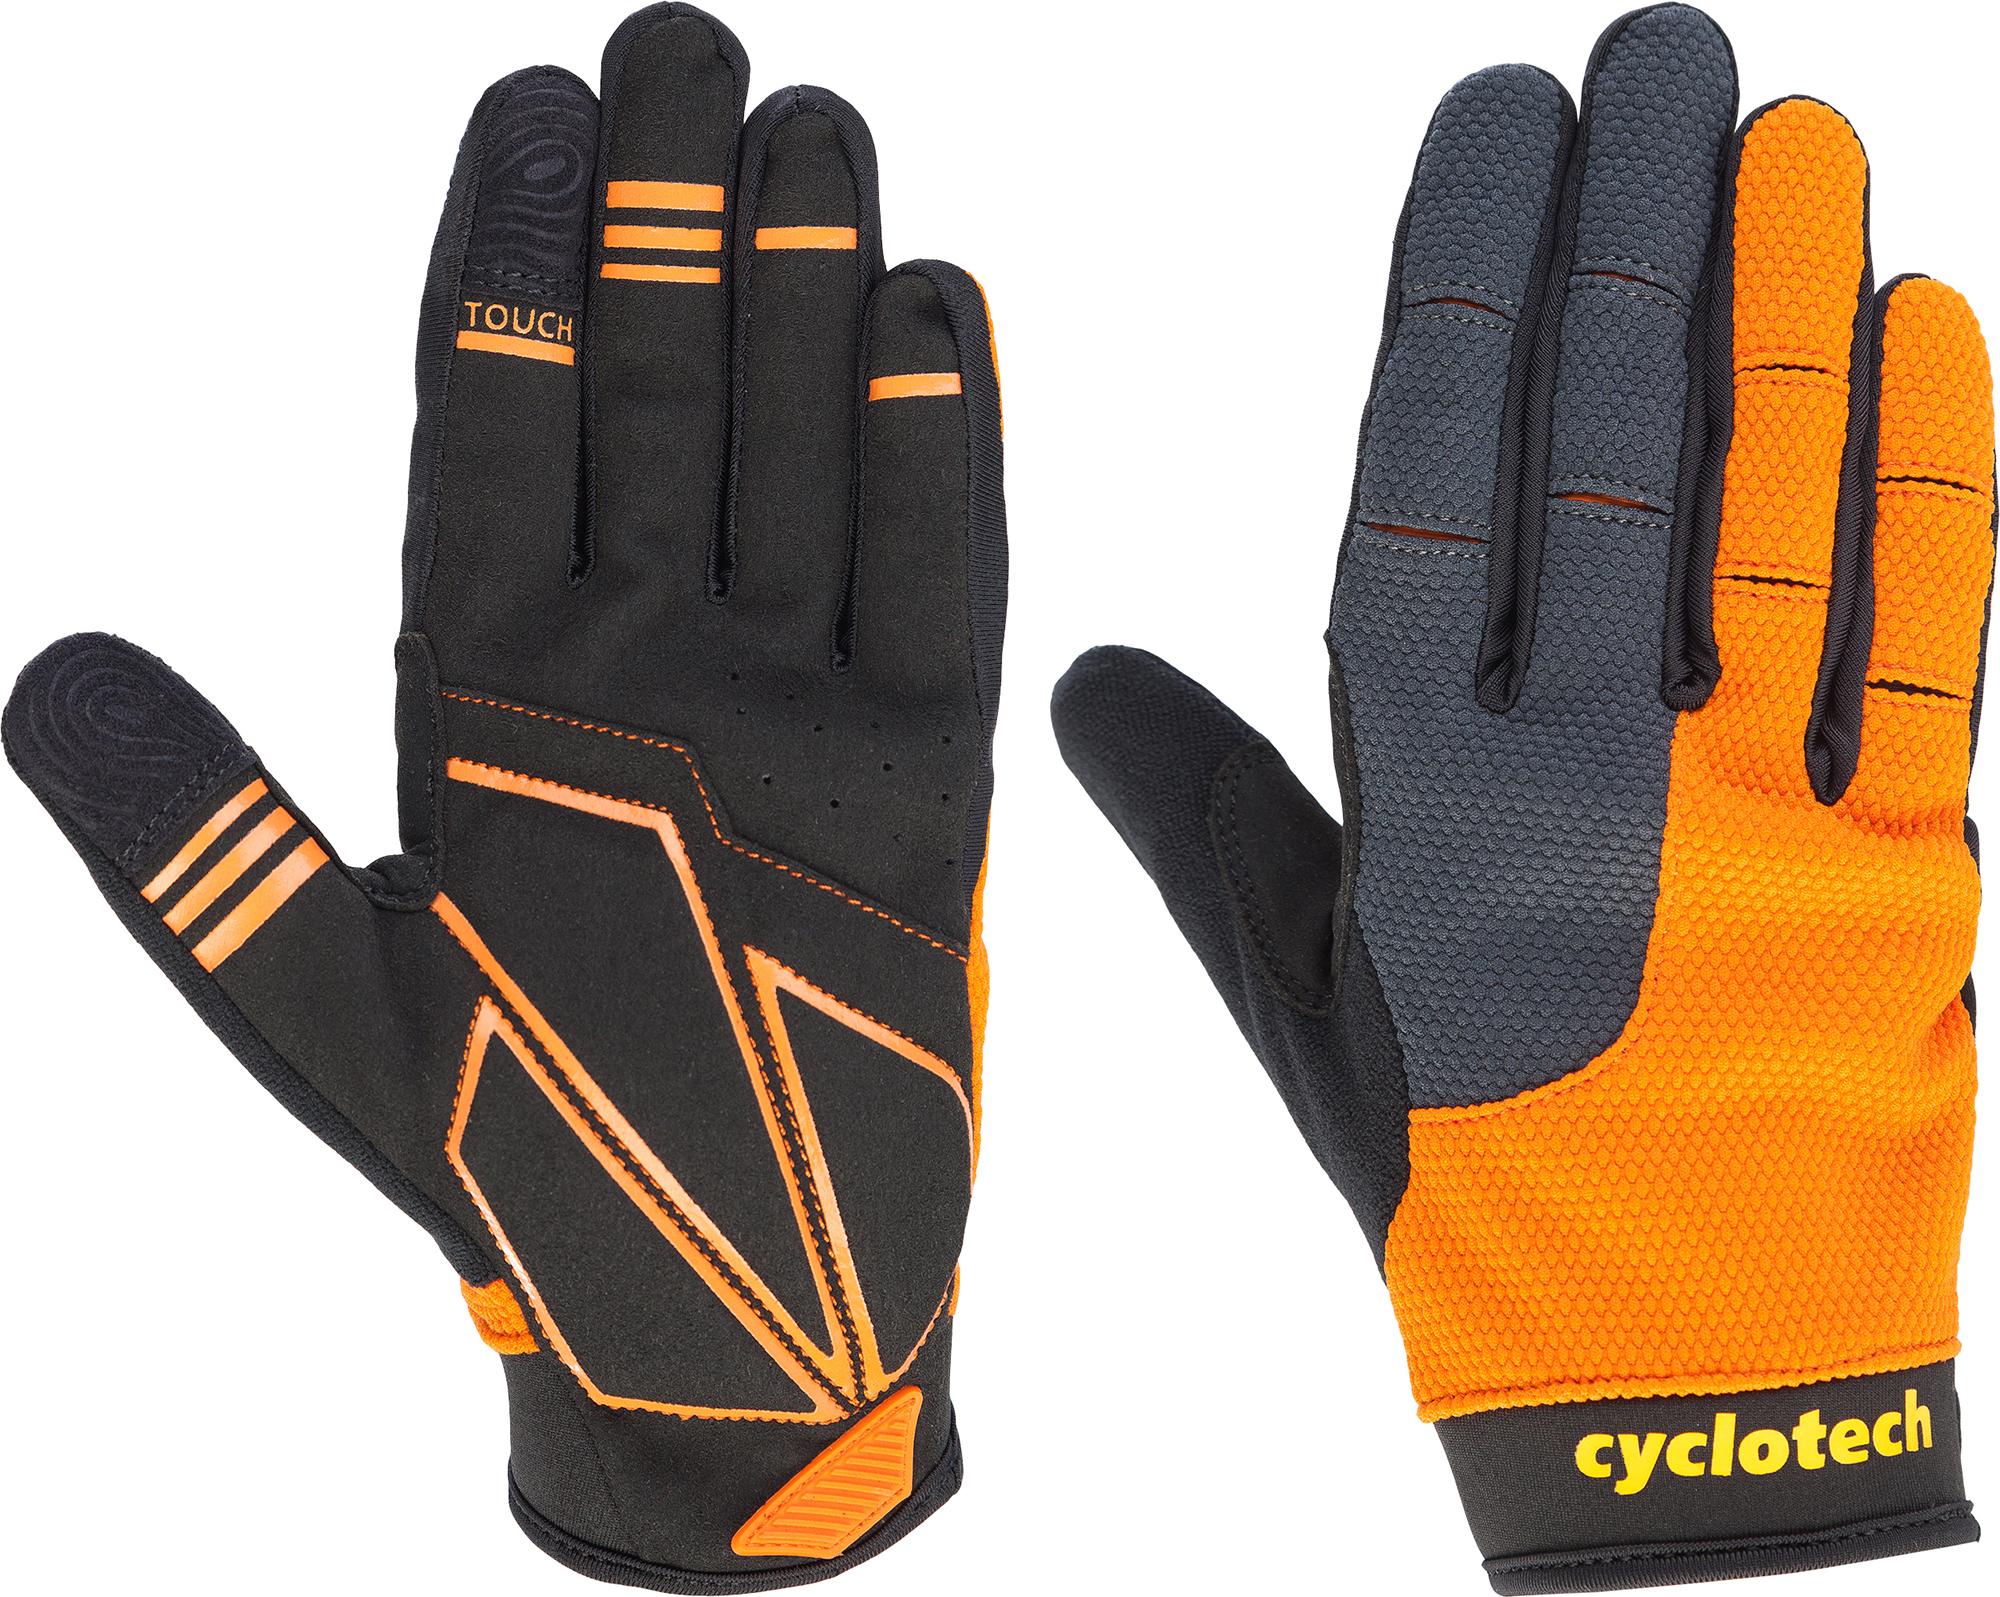 Cyclotech Перчатки велосипедные Cyclotech Nitro cyclotech выжимка цепи cyclotech